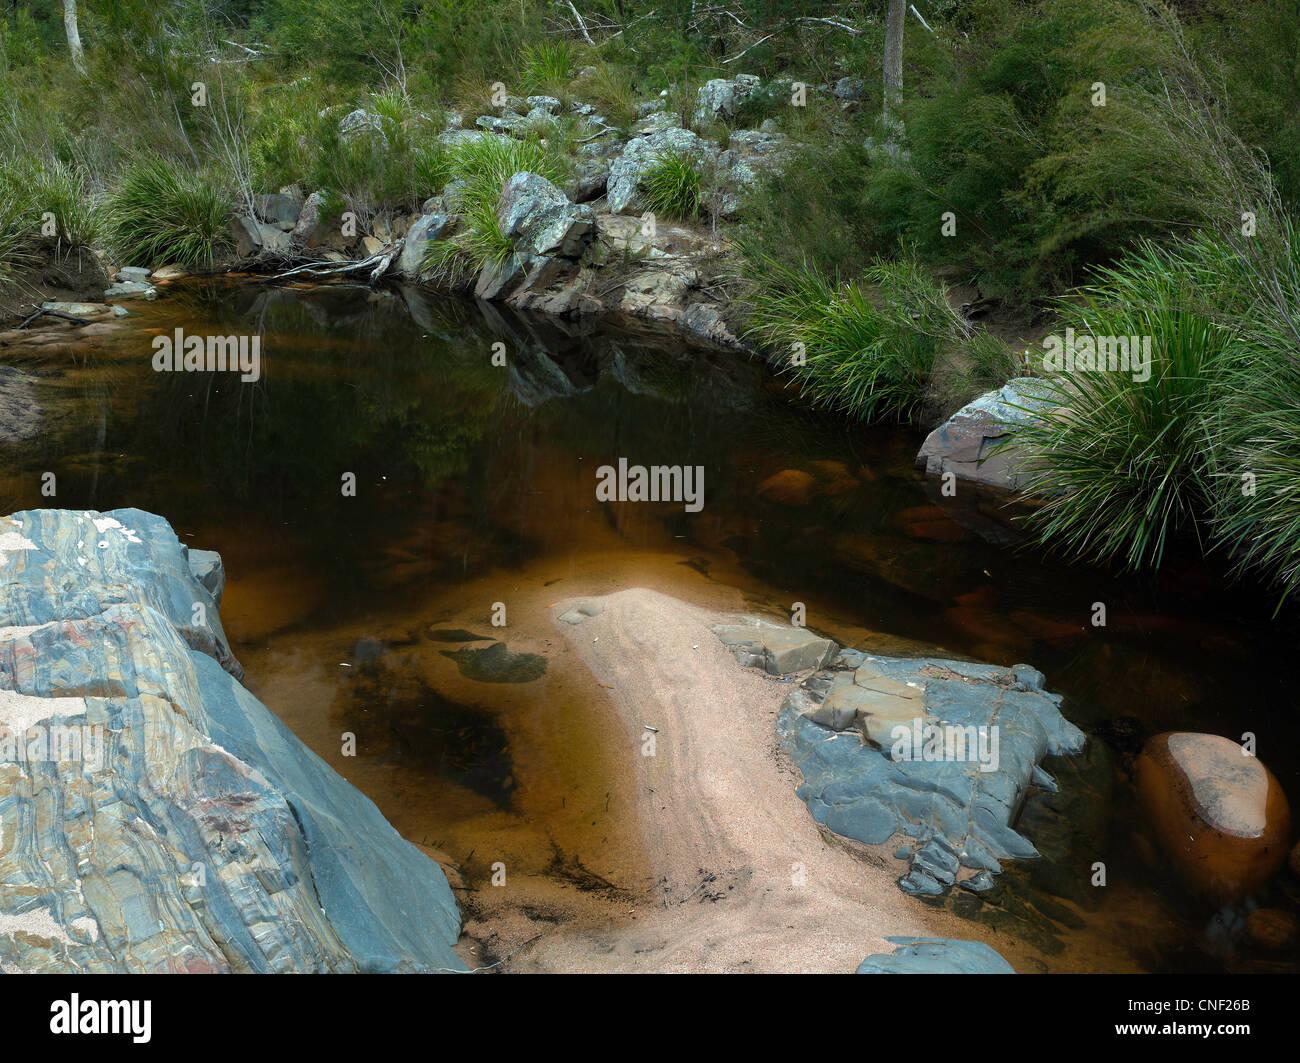 Billabong, Wadbilliga National Park, NSW Australia - Stock Image